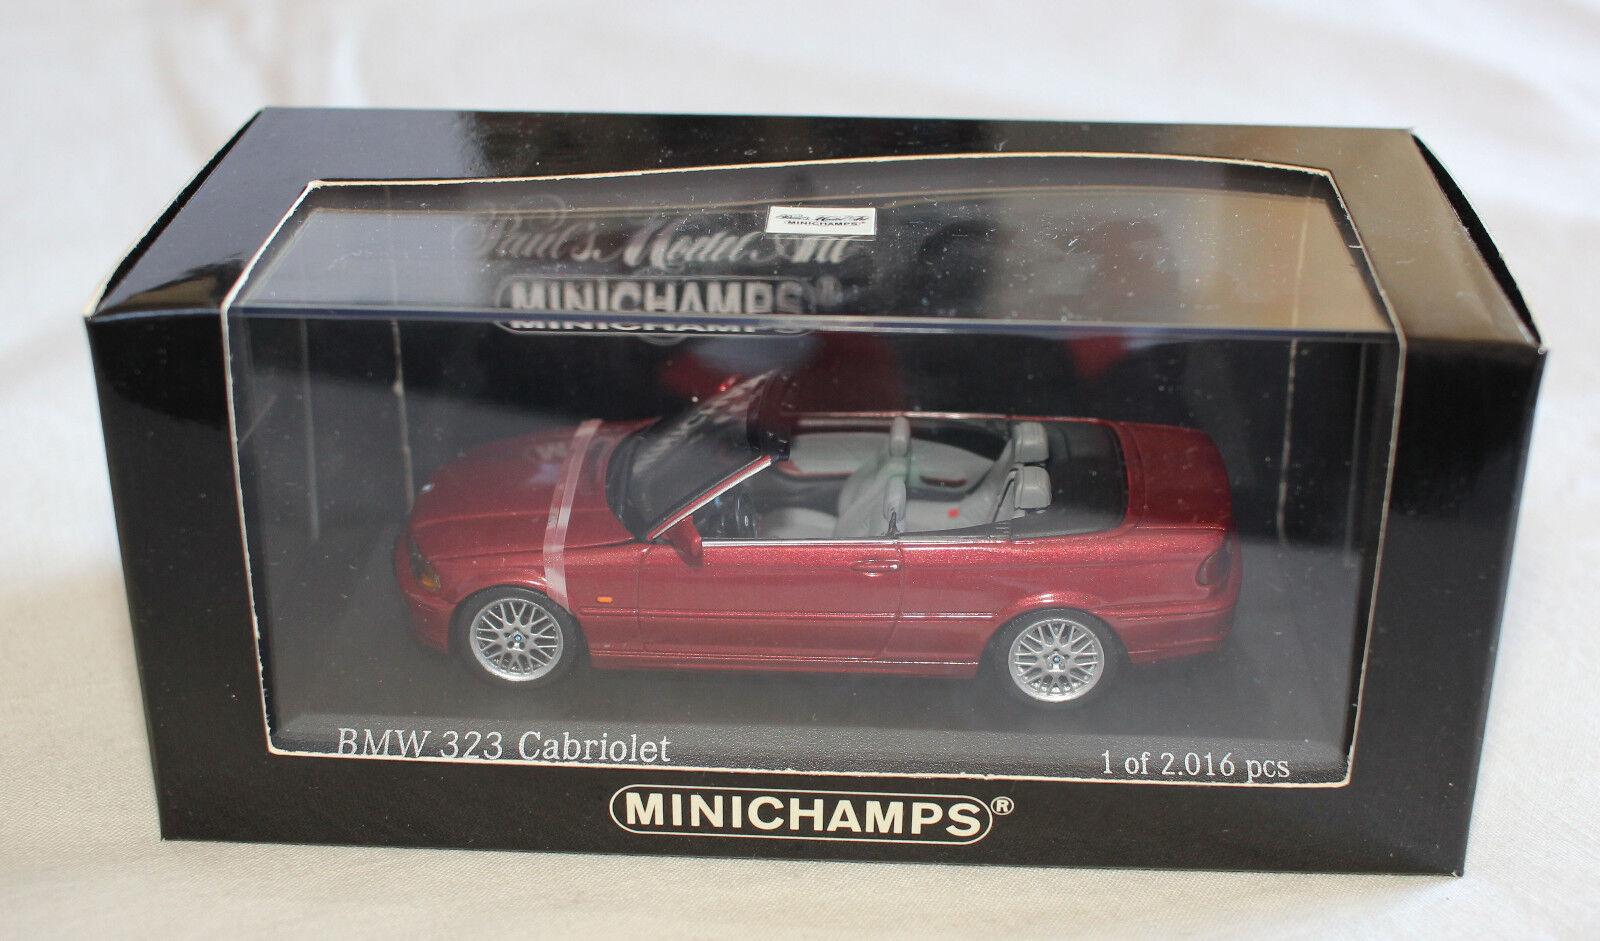 Minichamps 431028030 BMW E46 2000 323i Cabriolet Siena rouge Metallic 1 43